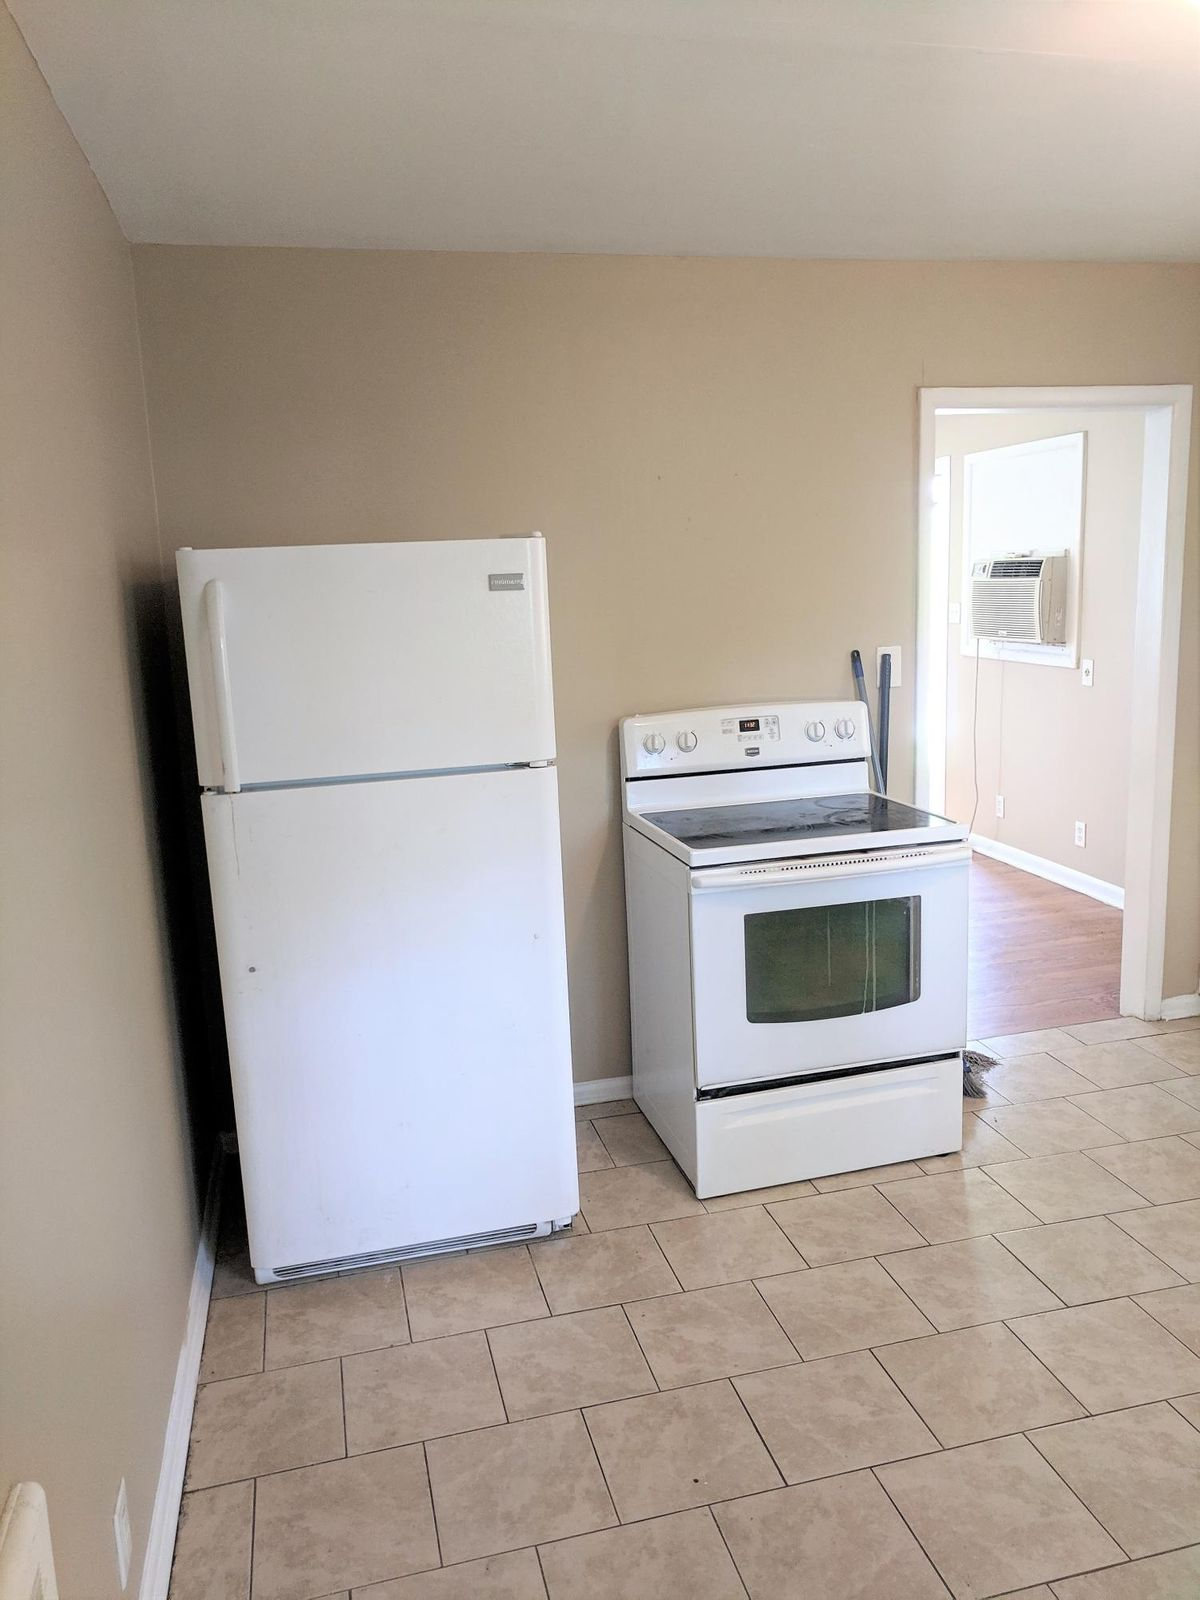 Kitchen 5504 5th St. #1